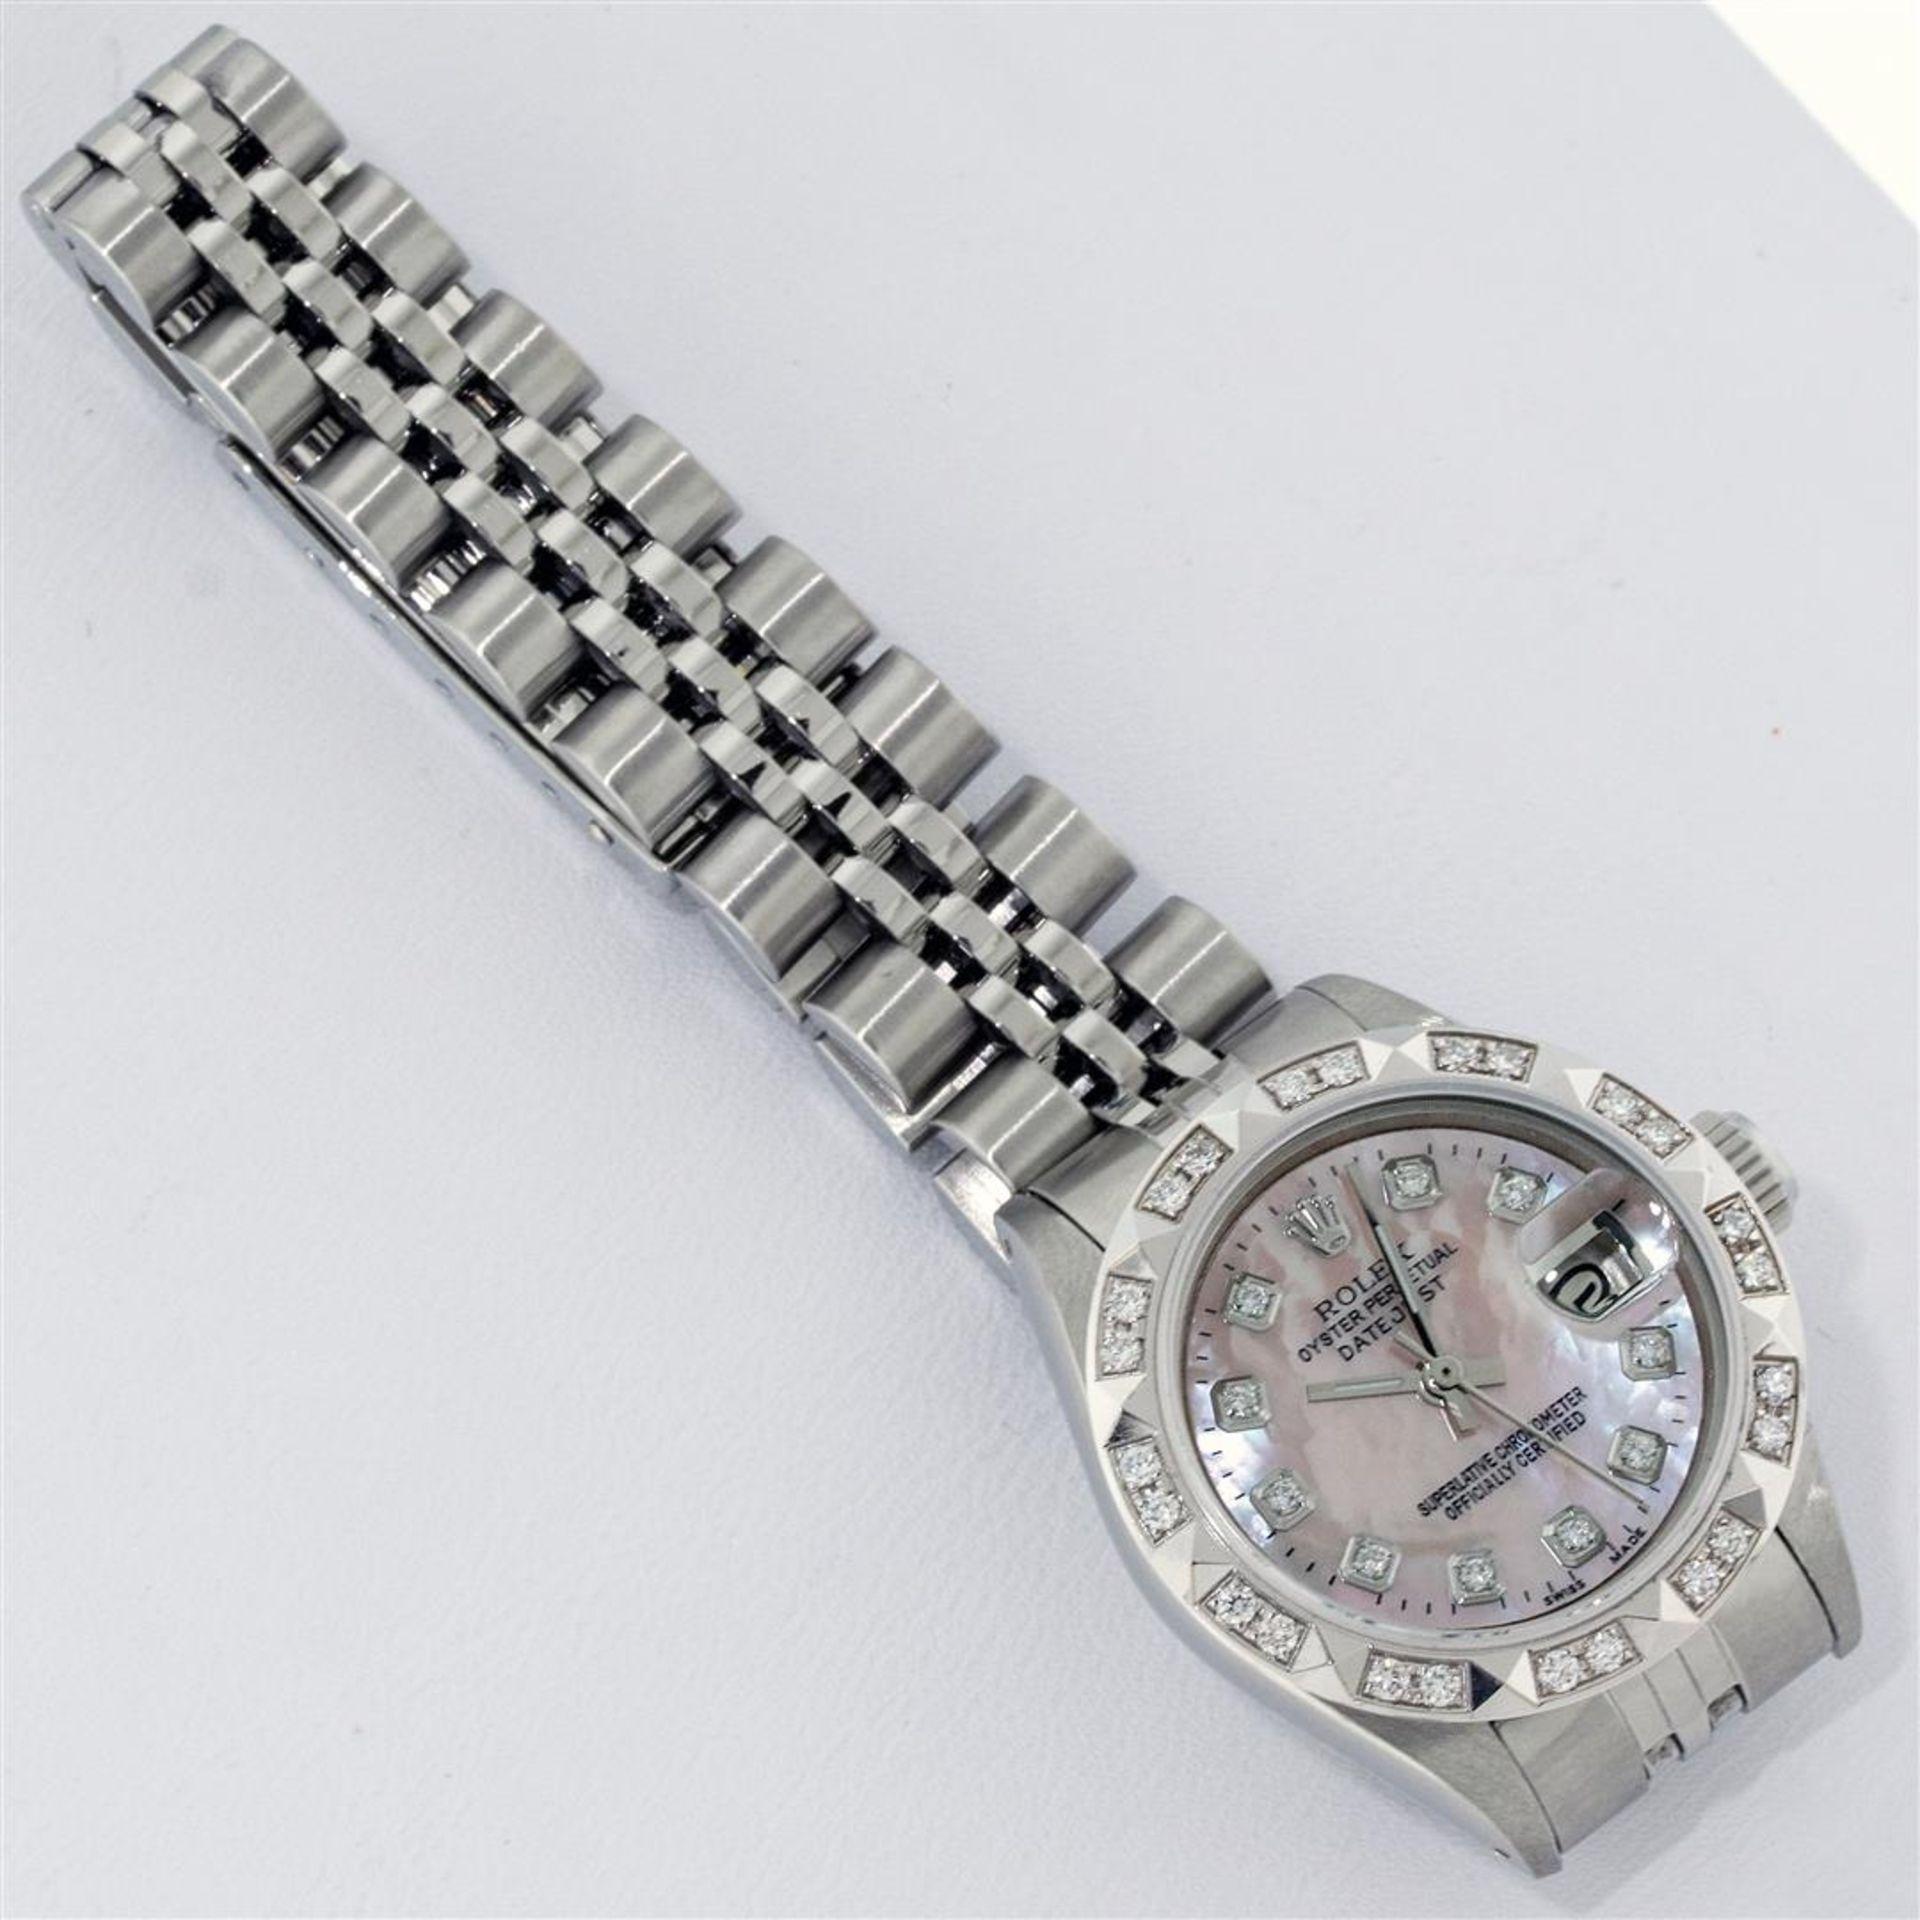 Rolex Ladies Stainless Steel Pink MOP Pyramid Diamond Datejust Wristwatch 26MM - Image 4 of 9